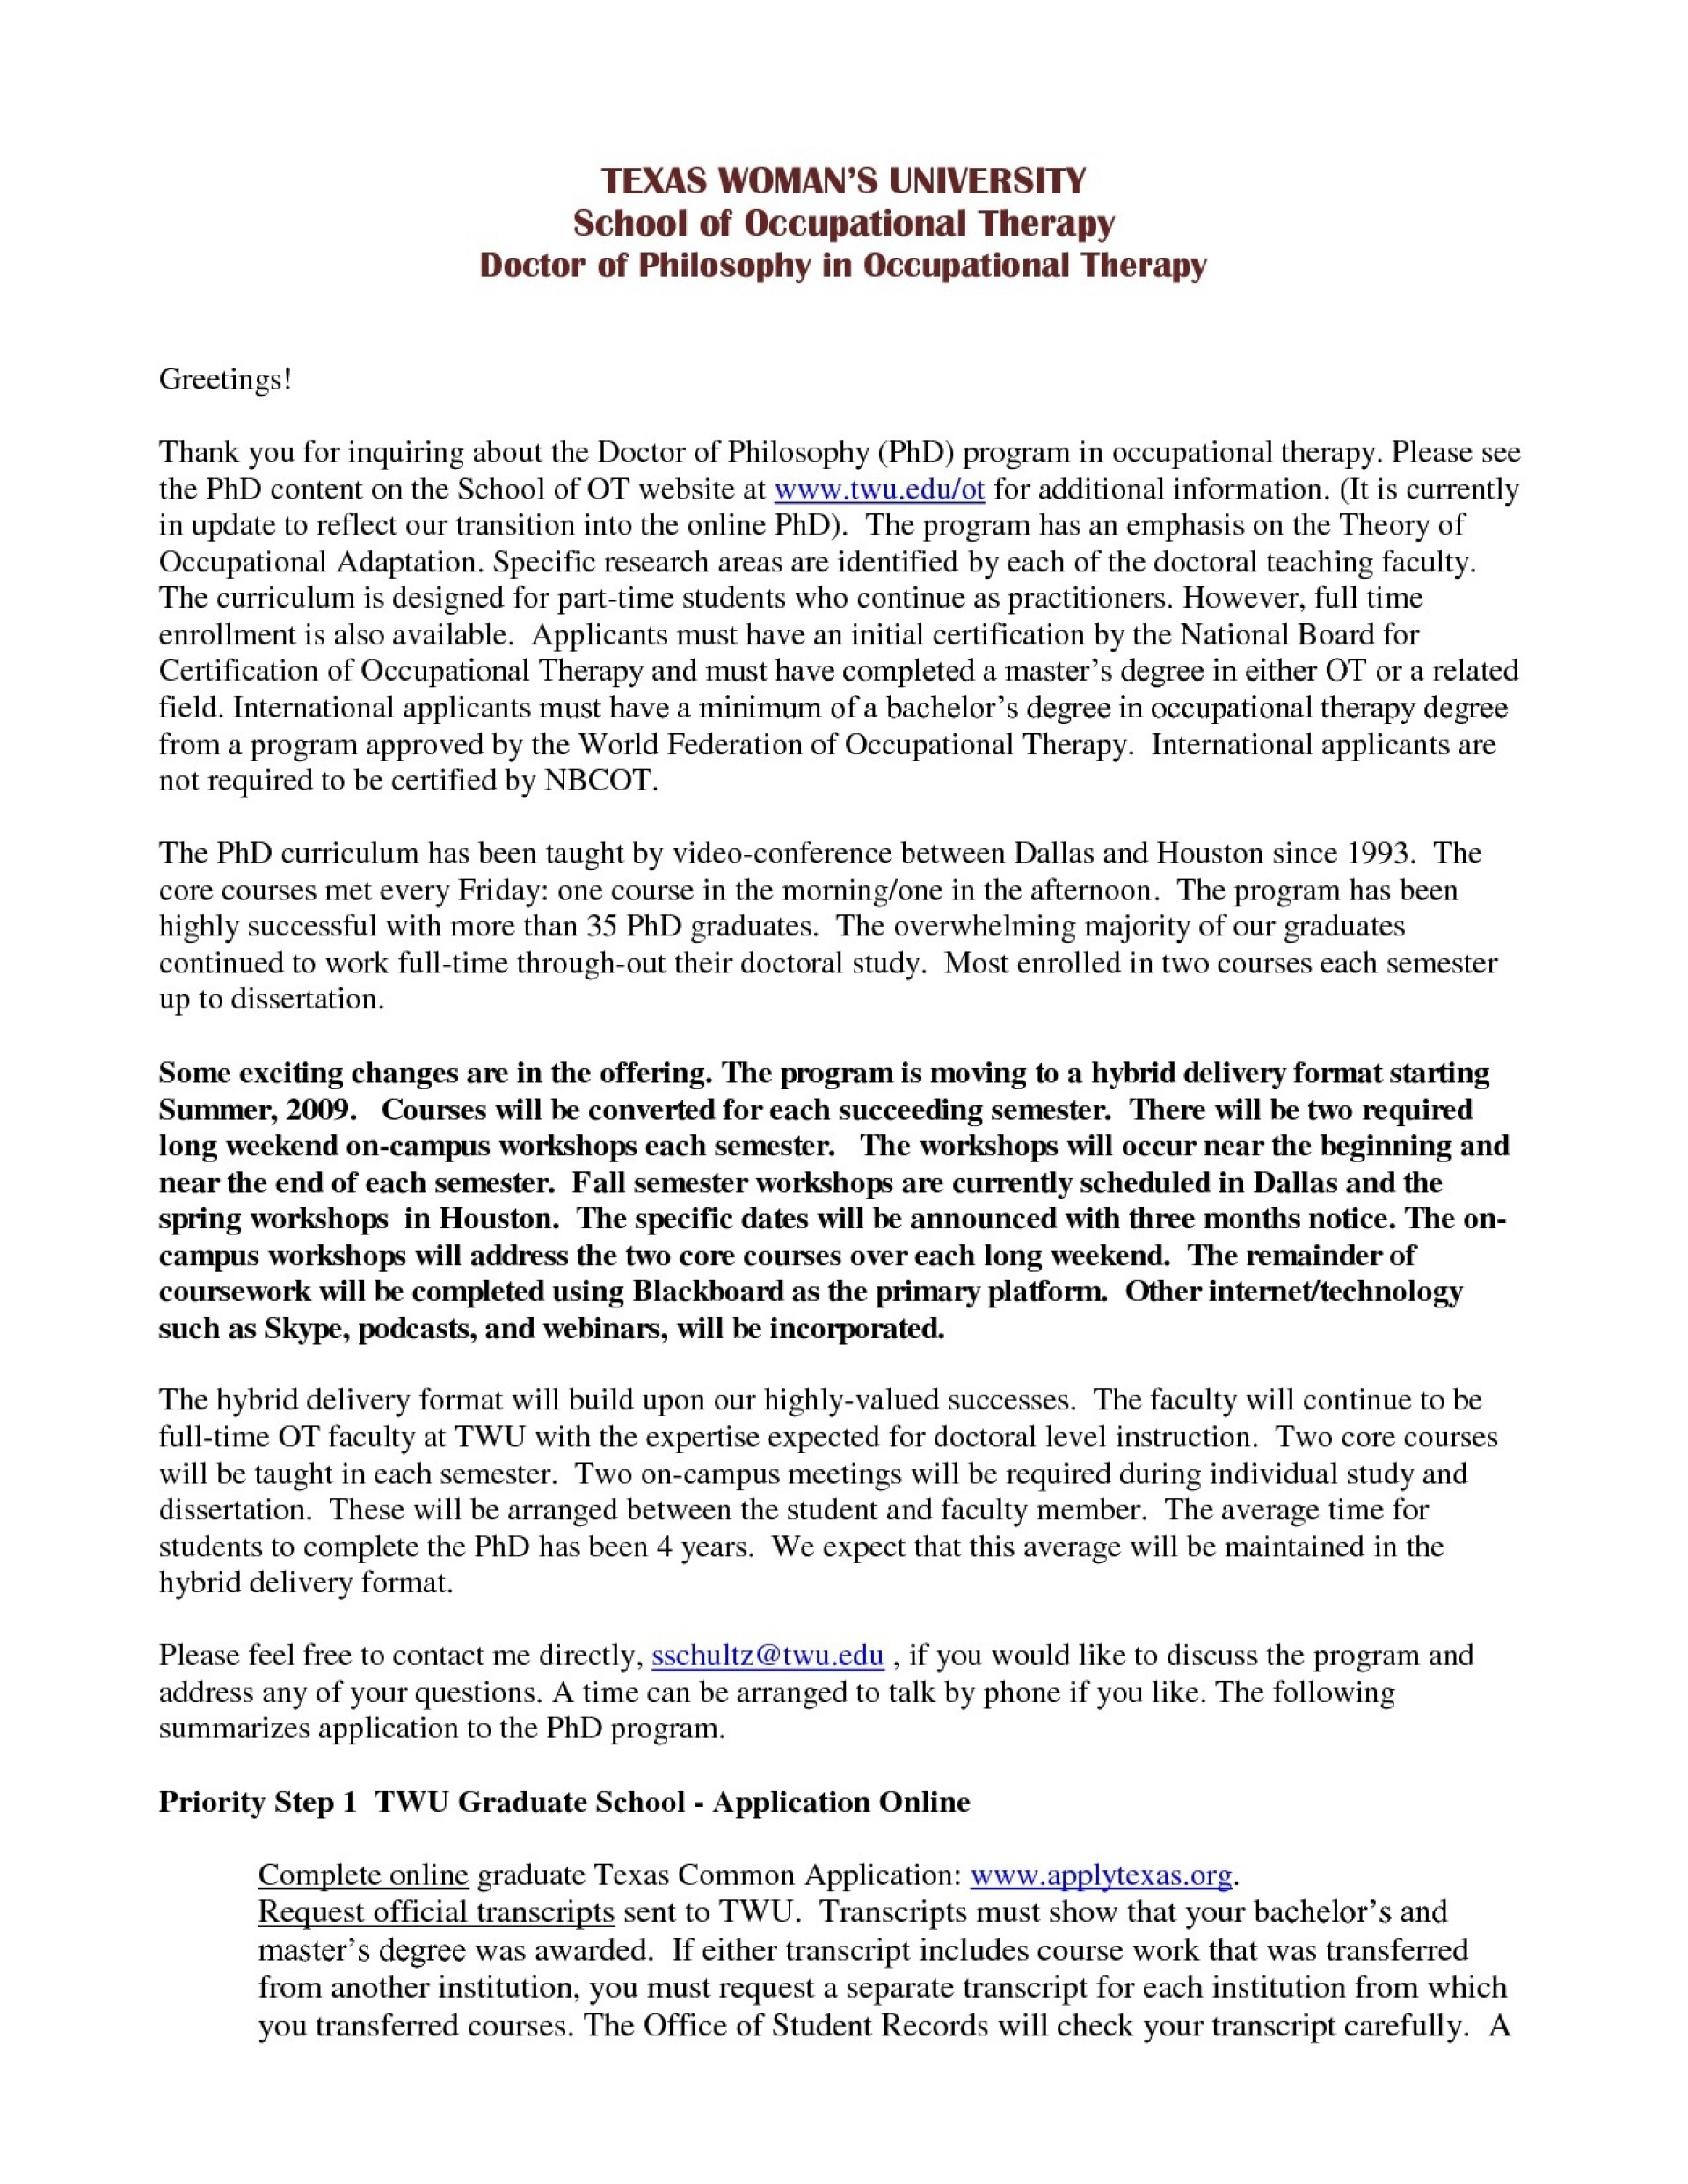 013 Apply Texas Essay Questions Poemsrom Co Common Ap Joli Vibramusic For College Prompts Exa Topics Unusual Examples Topic A C 2017 1920